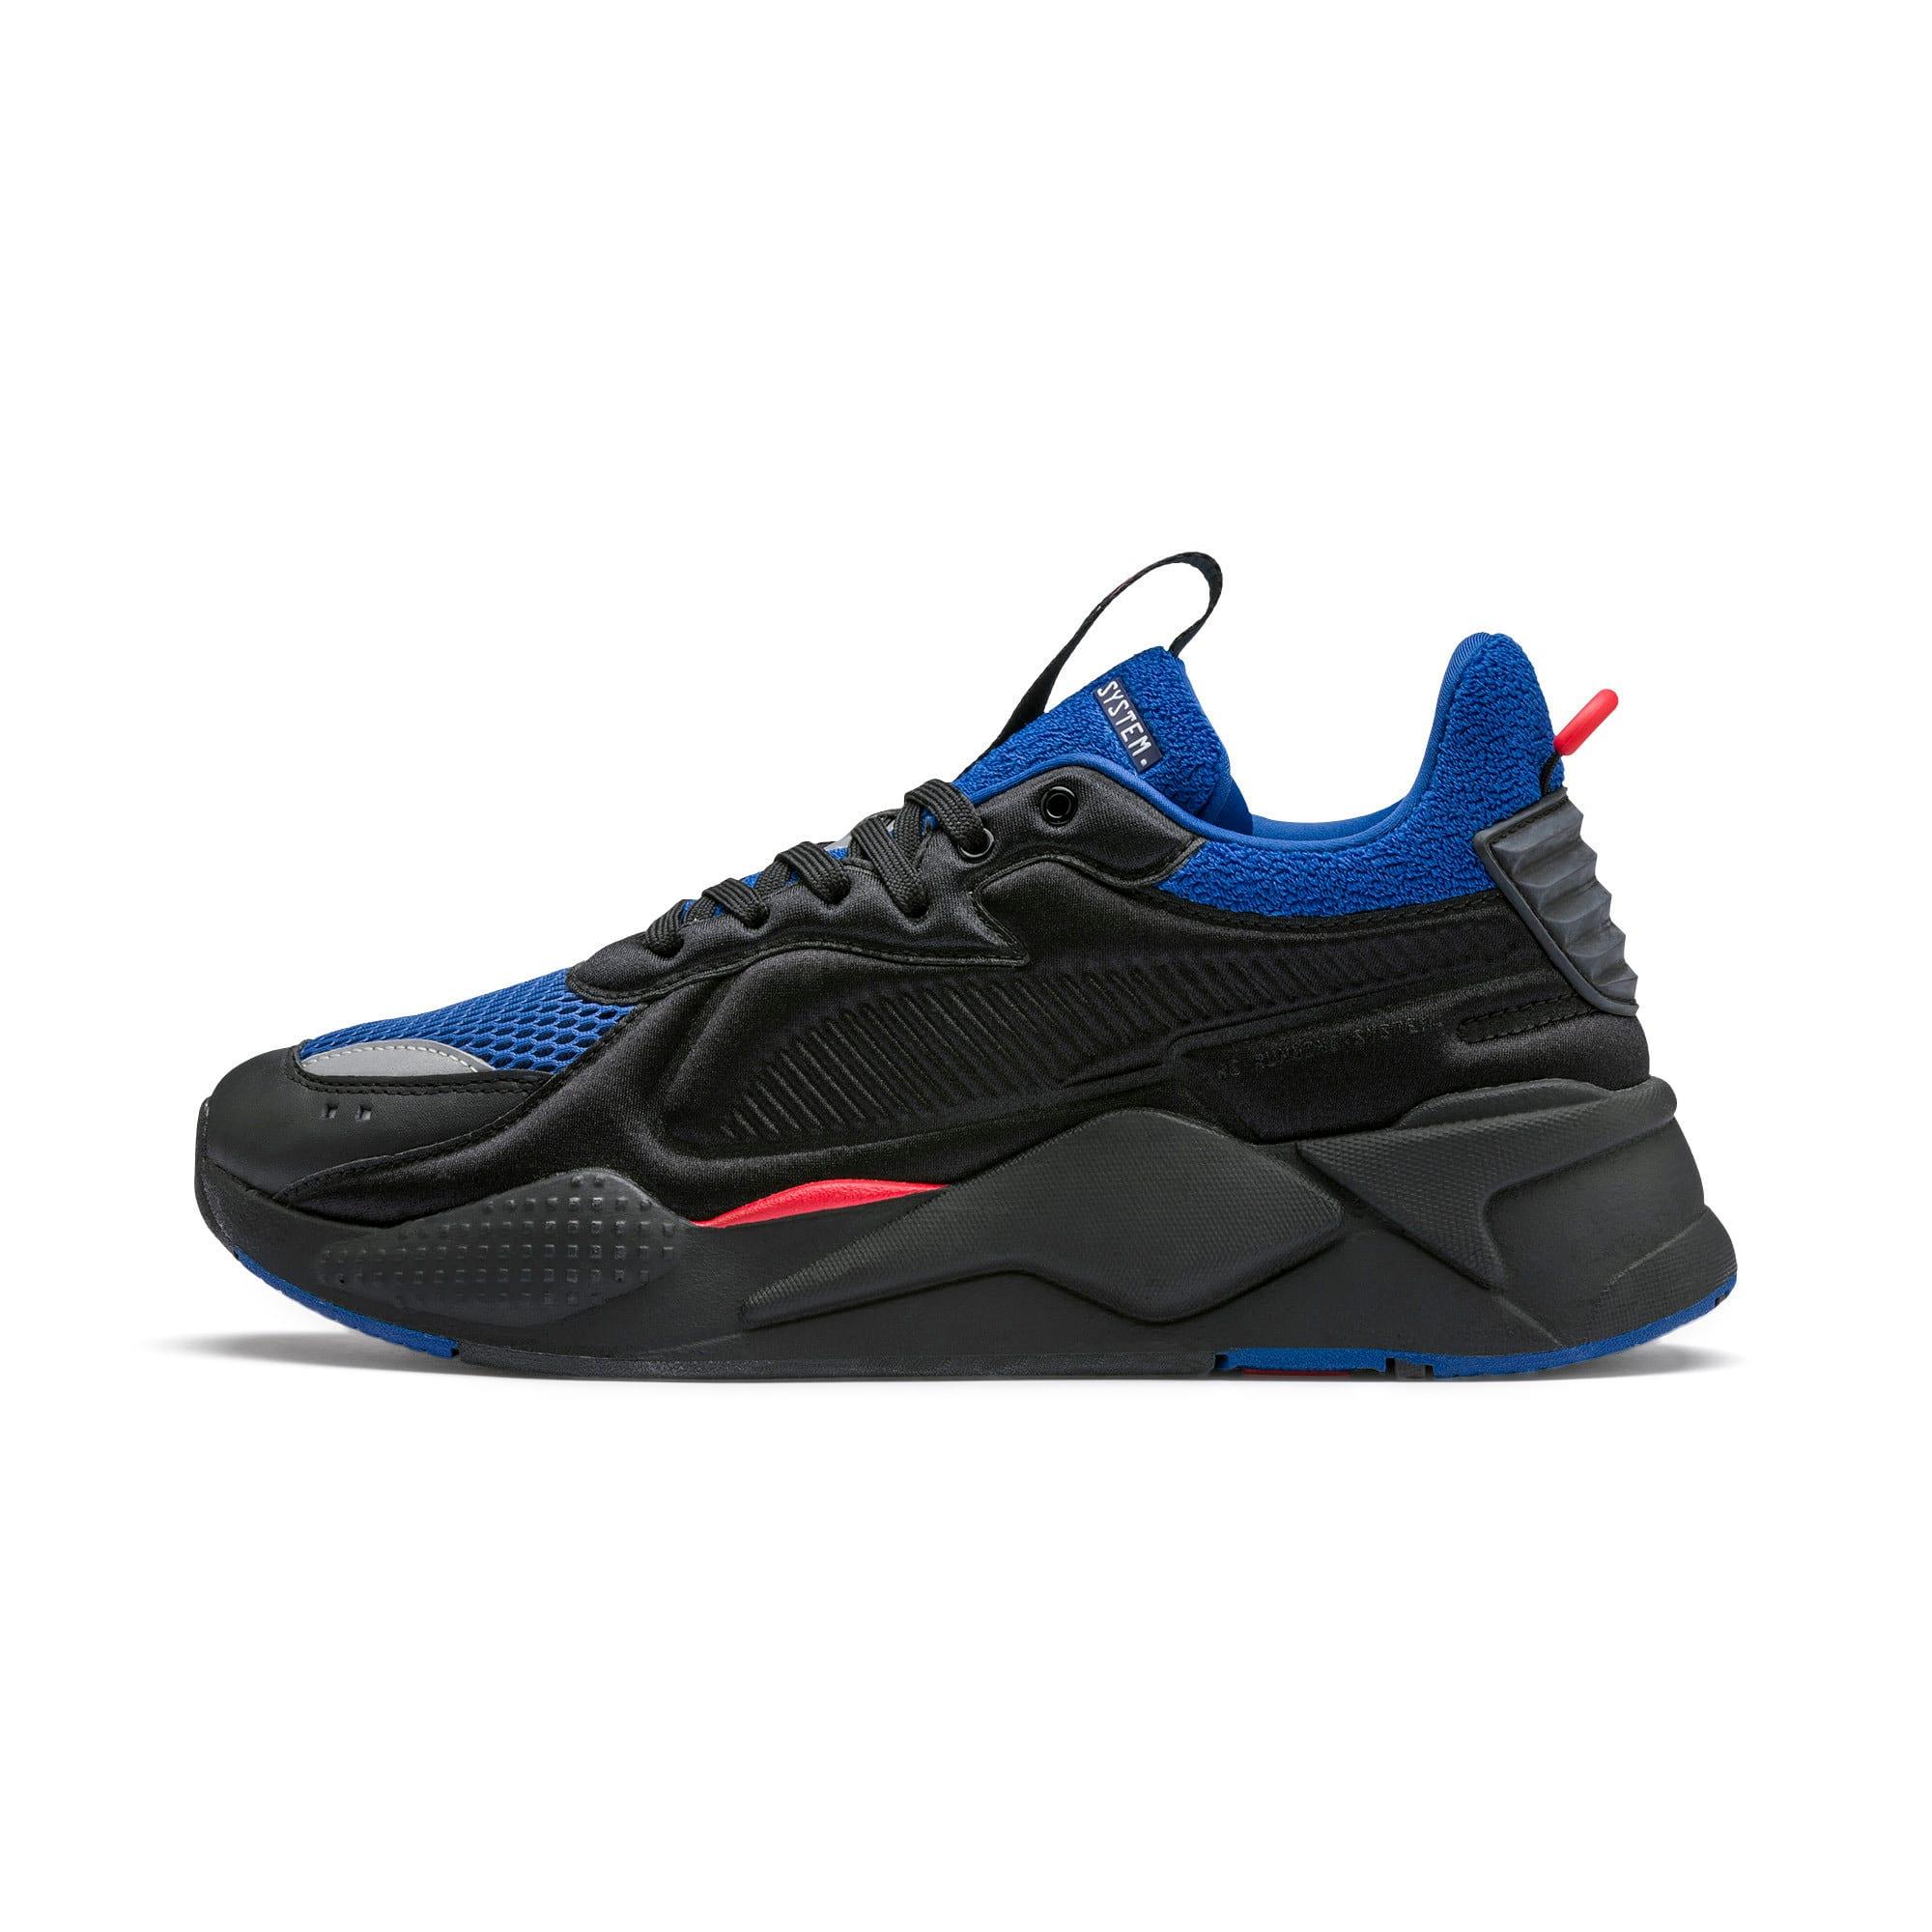 Thumbnail 1 of Basket RS-X Softcase, Puma Black-Galaxy Blue, medium